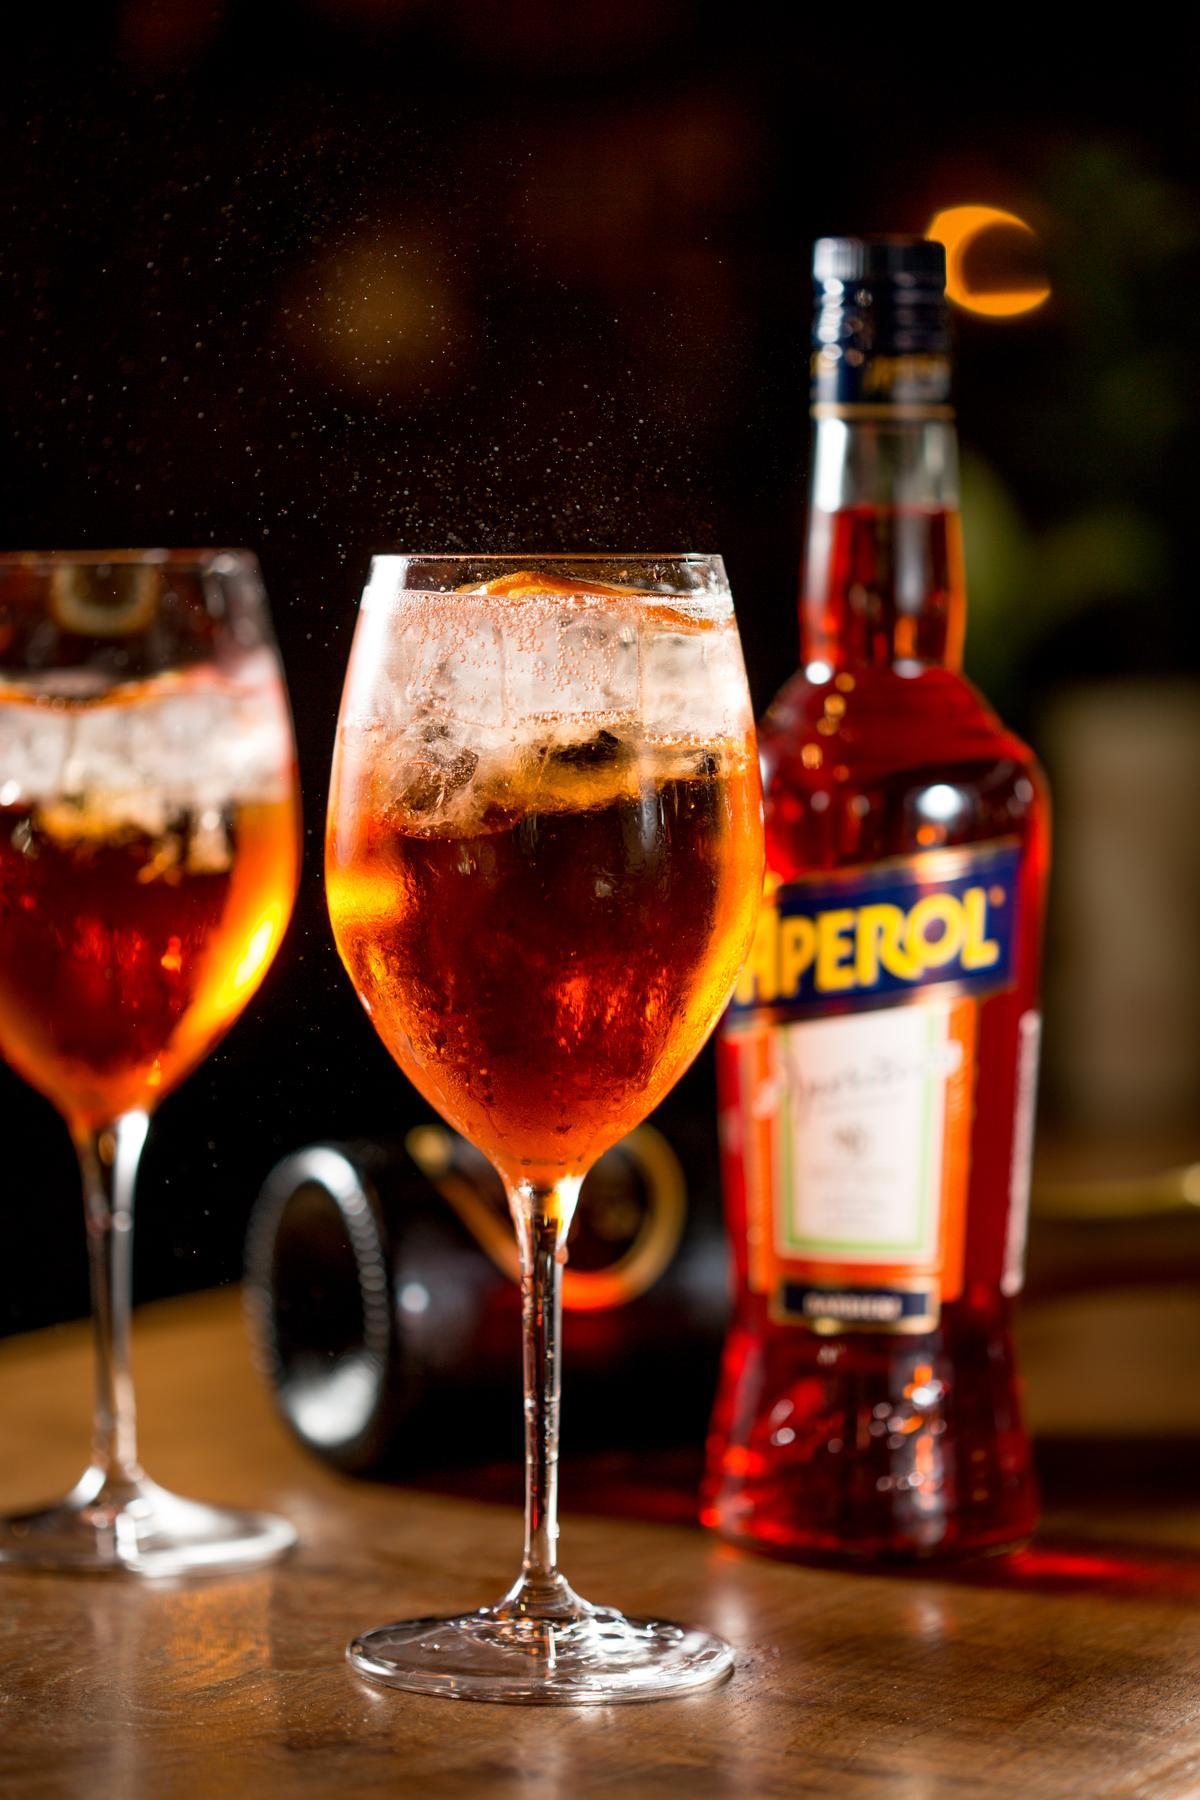 Aperol Spritz在義大利家喻戶曉,市面上甚至還有現成罐裝調酒。